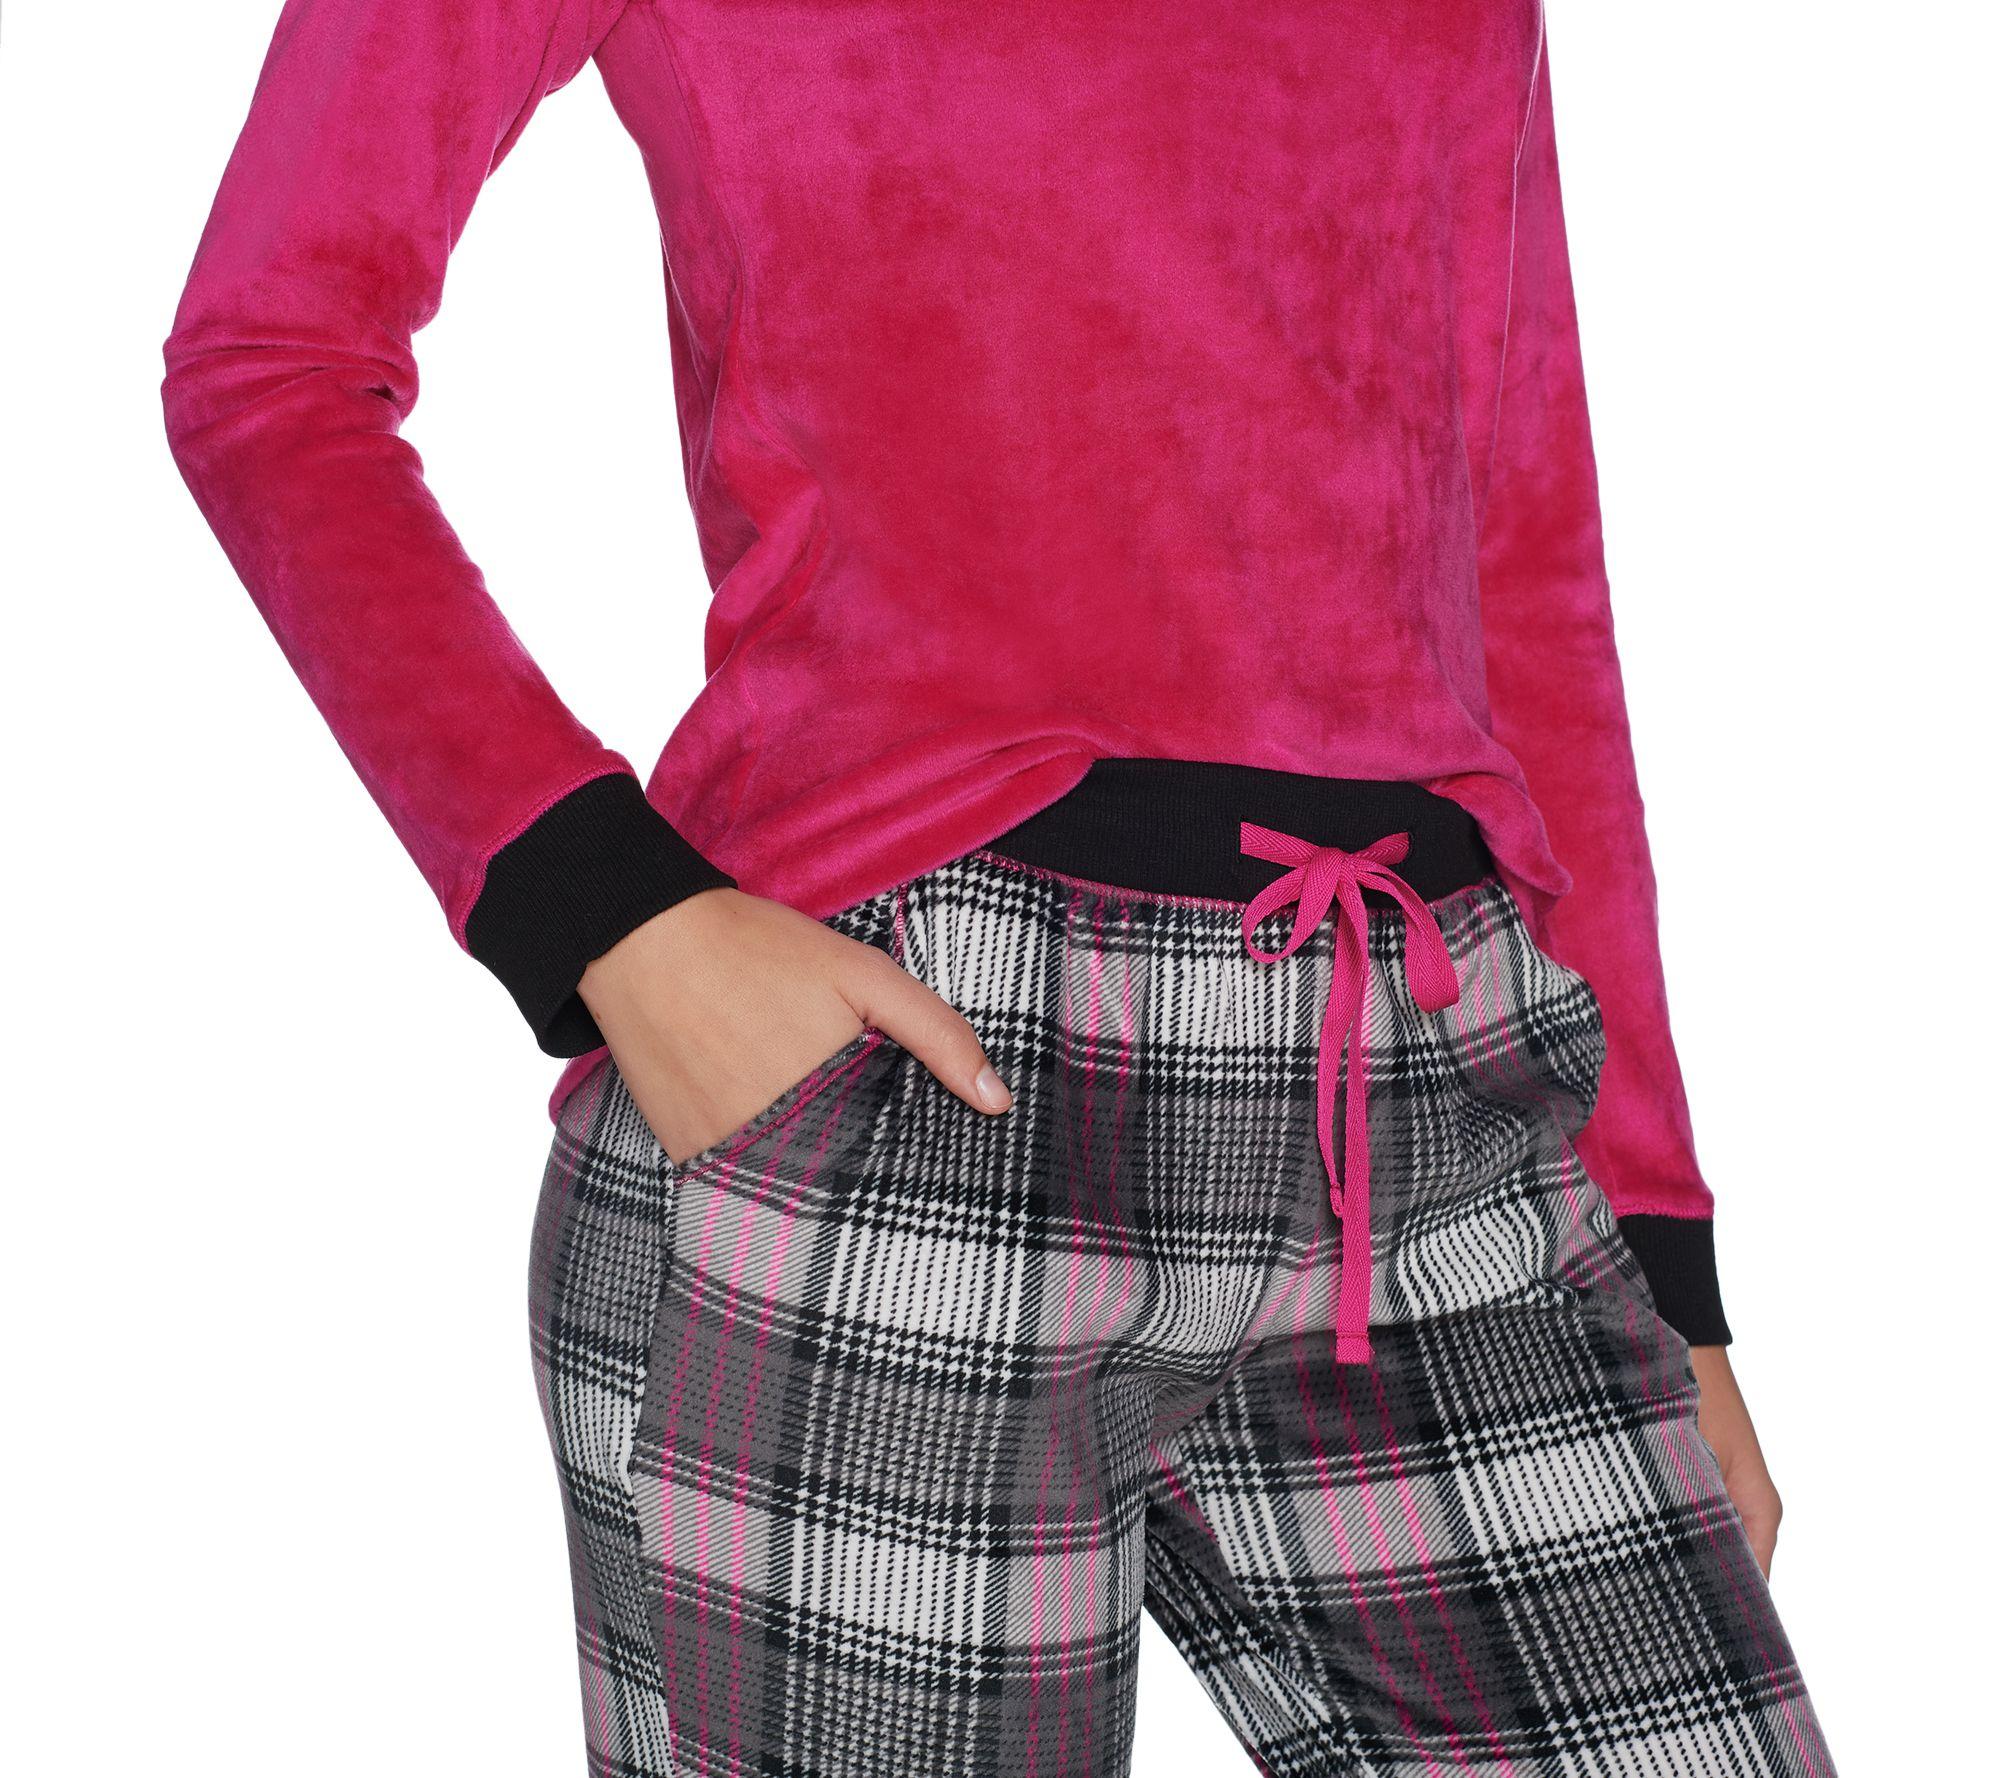 e0c297764fbcf8 Cuddl Duds Petite Ultra Plush Velvet Fleece Pajama Set - Page 1 — QVC.com